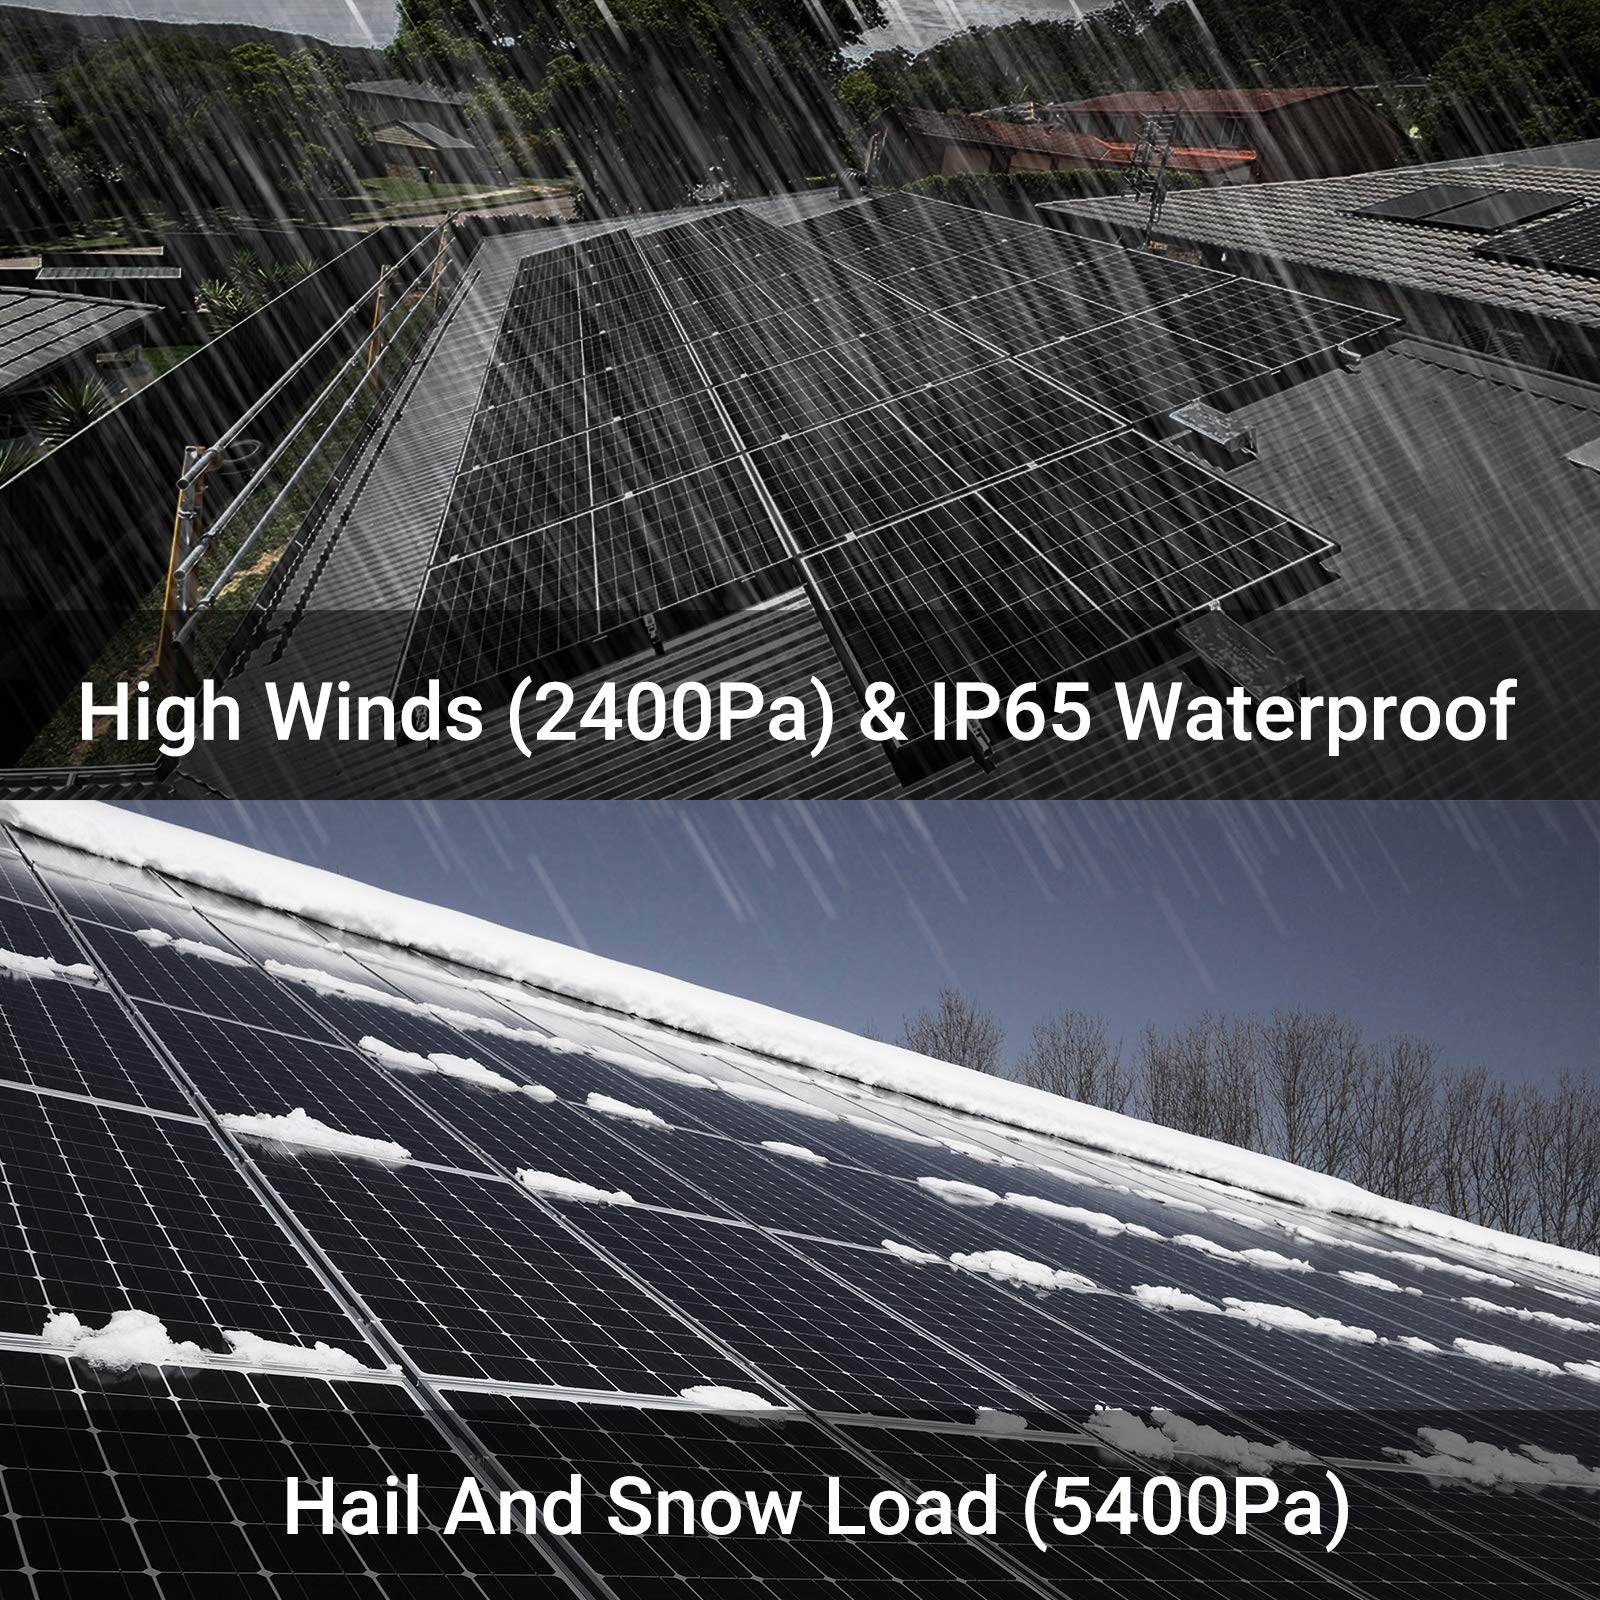 Newpowa 180W(Watt) Solar Panel 180W>170W 12V Monocrystalline High Efficiency PV Module Off Grid for RV Trailer Camper Roof Top